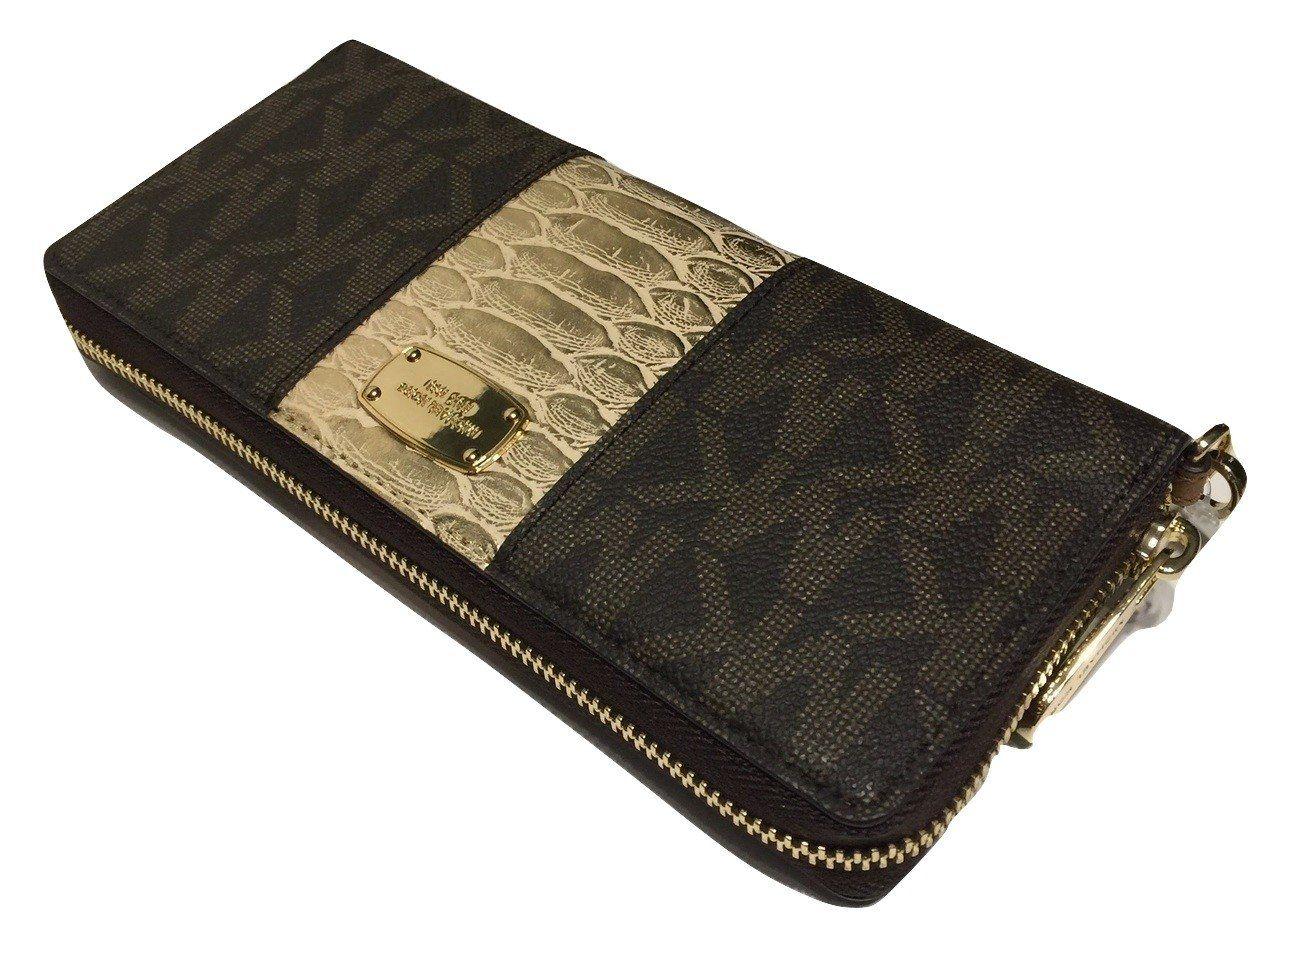 c0231fd13628 MICHAEL Michael Kors Womens Jet Set Travel Center Stripe Large Carry All  Tote bundled with Michael Kors Center Stripe Travel Continental Wallet  Wristlet ...